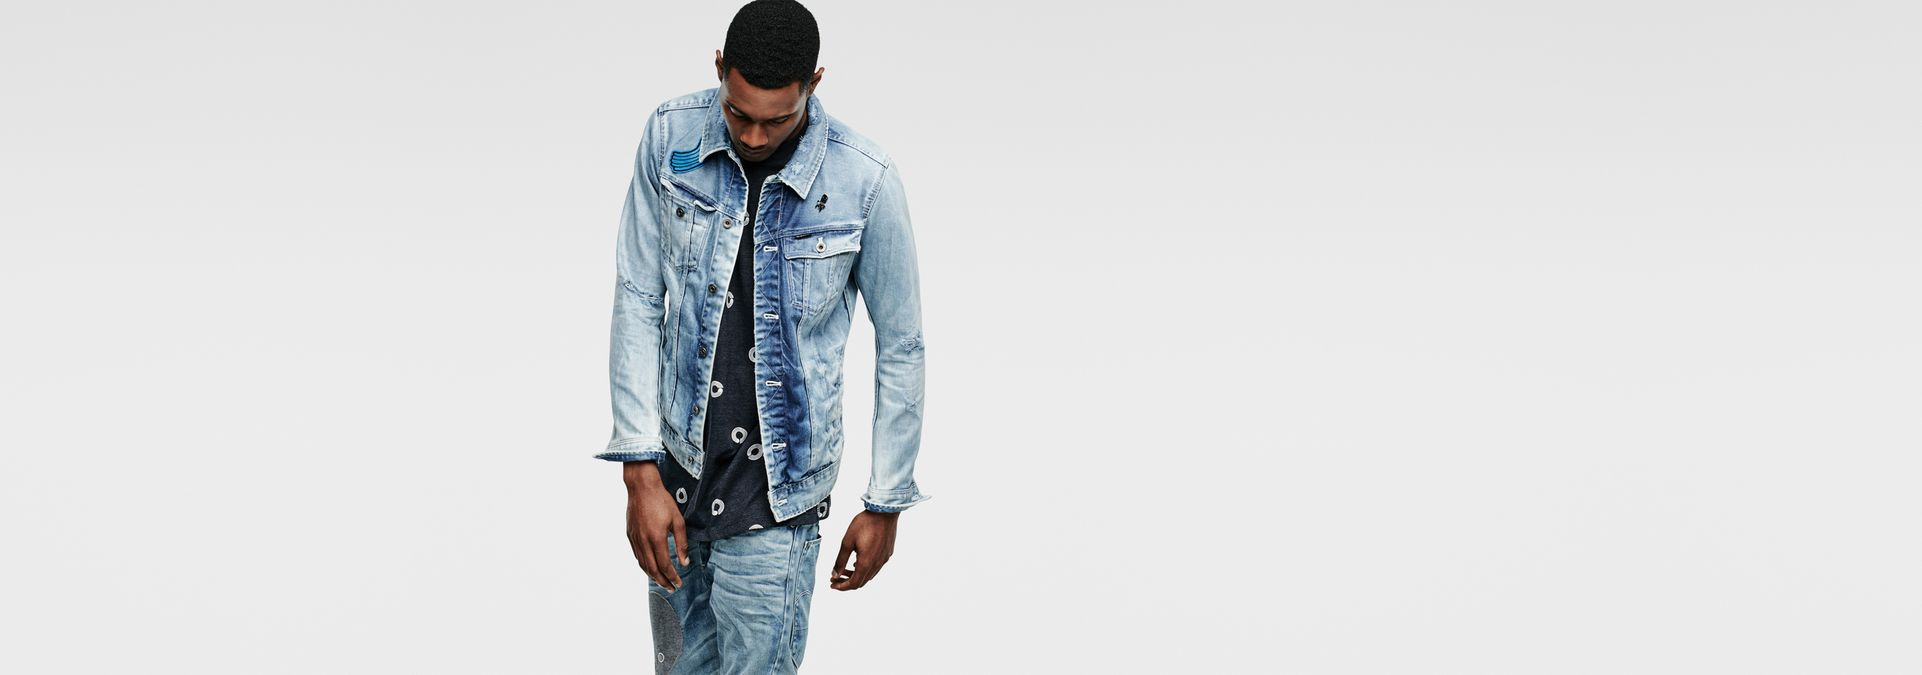 raw for the oceans slim tailor 3d jacket g star raw. Black Bedroom Furniture Sets. Home Design Ideas